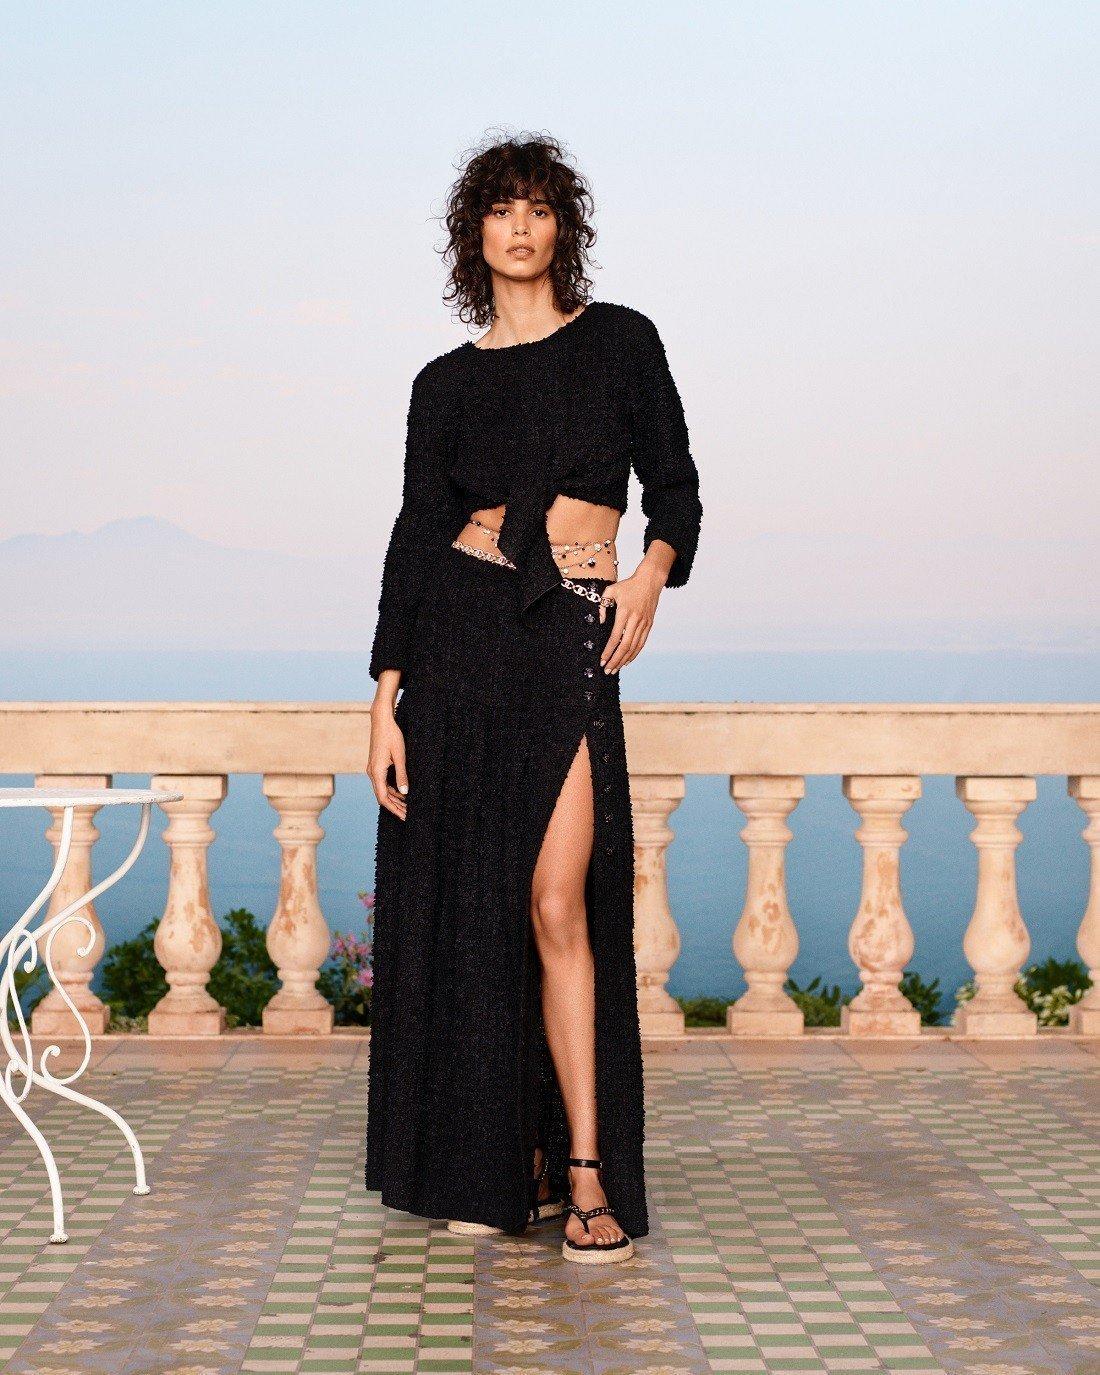 Chanel cruise 2020/21